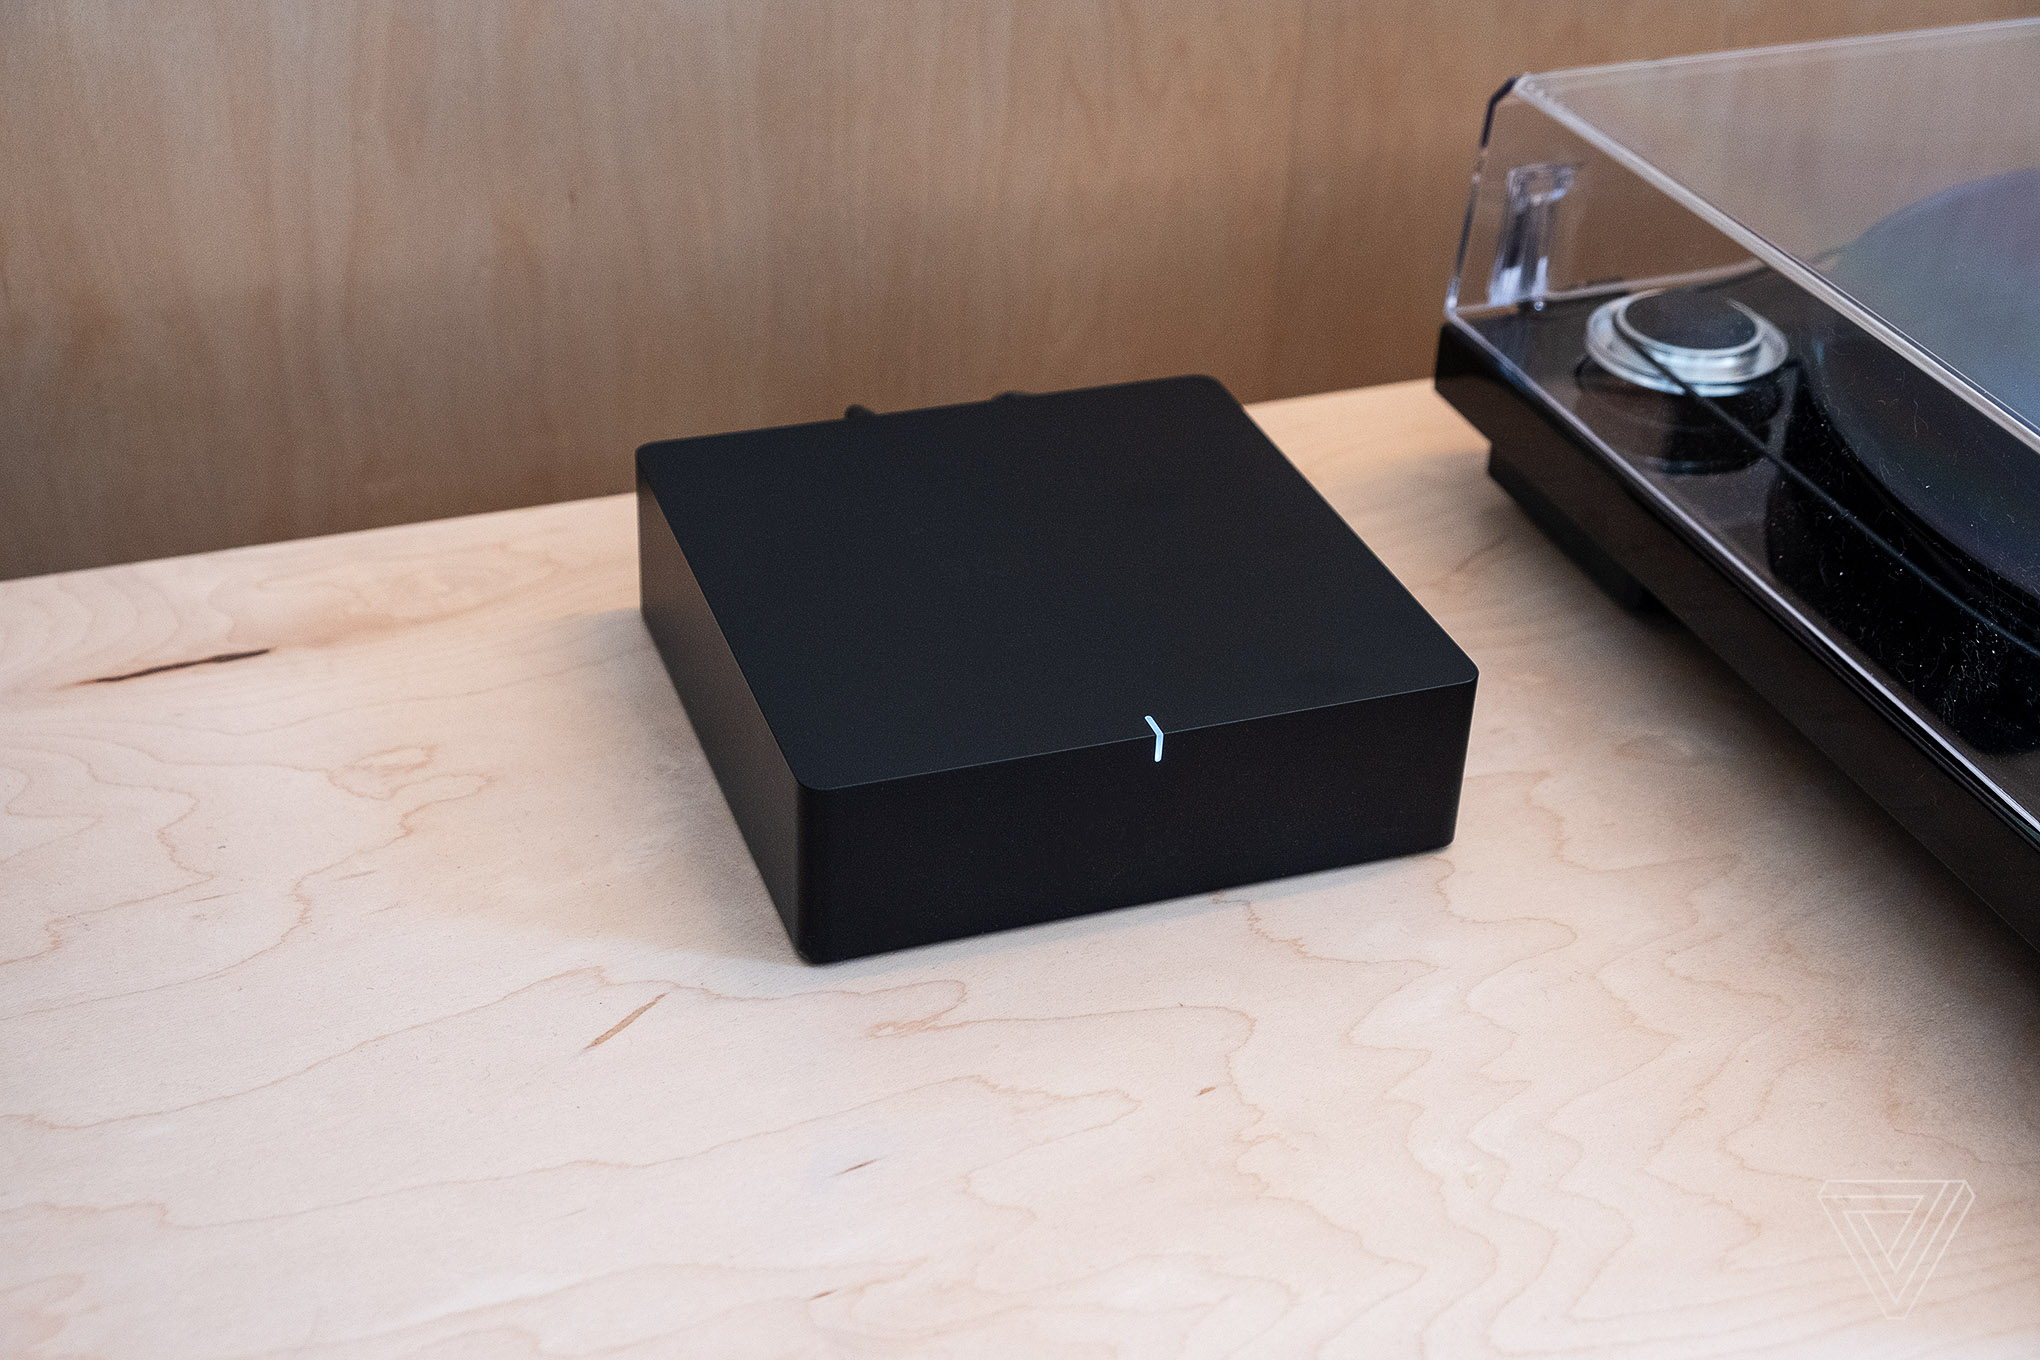 The Sonos Port